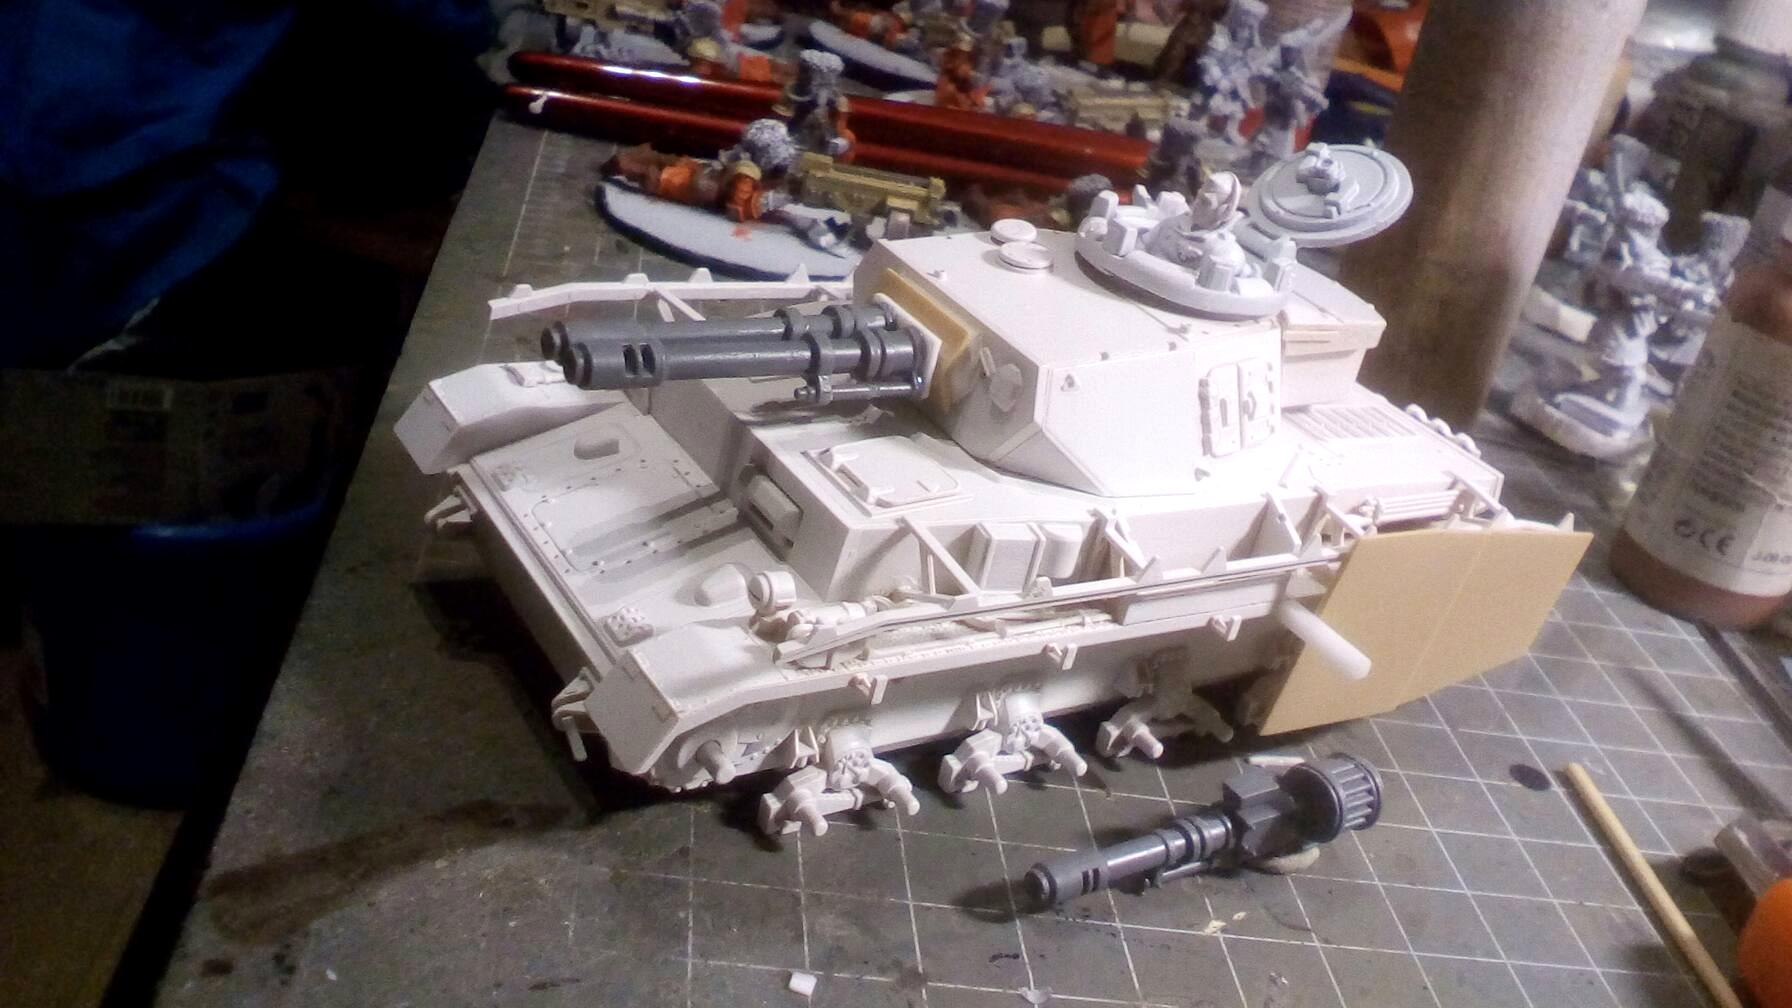 Carnodon, Conversion, Guard, Panzer Iv